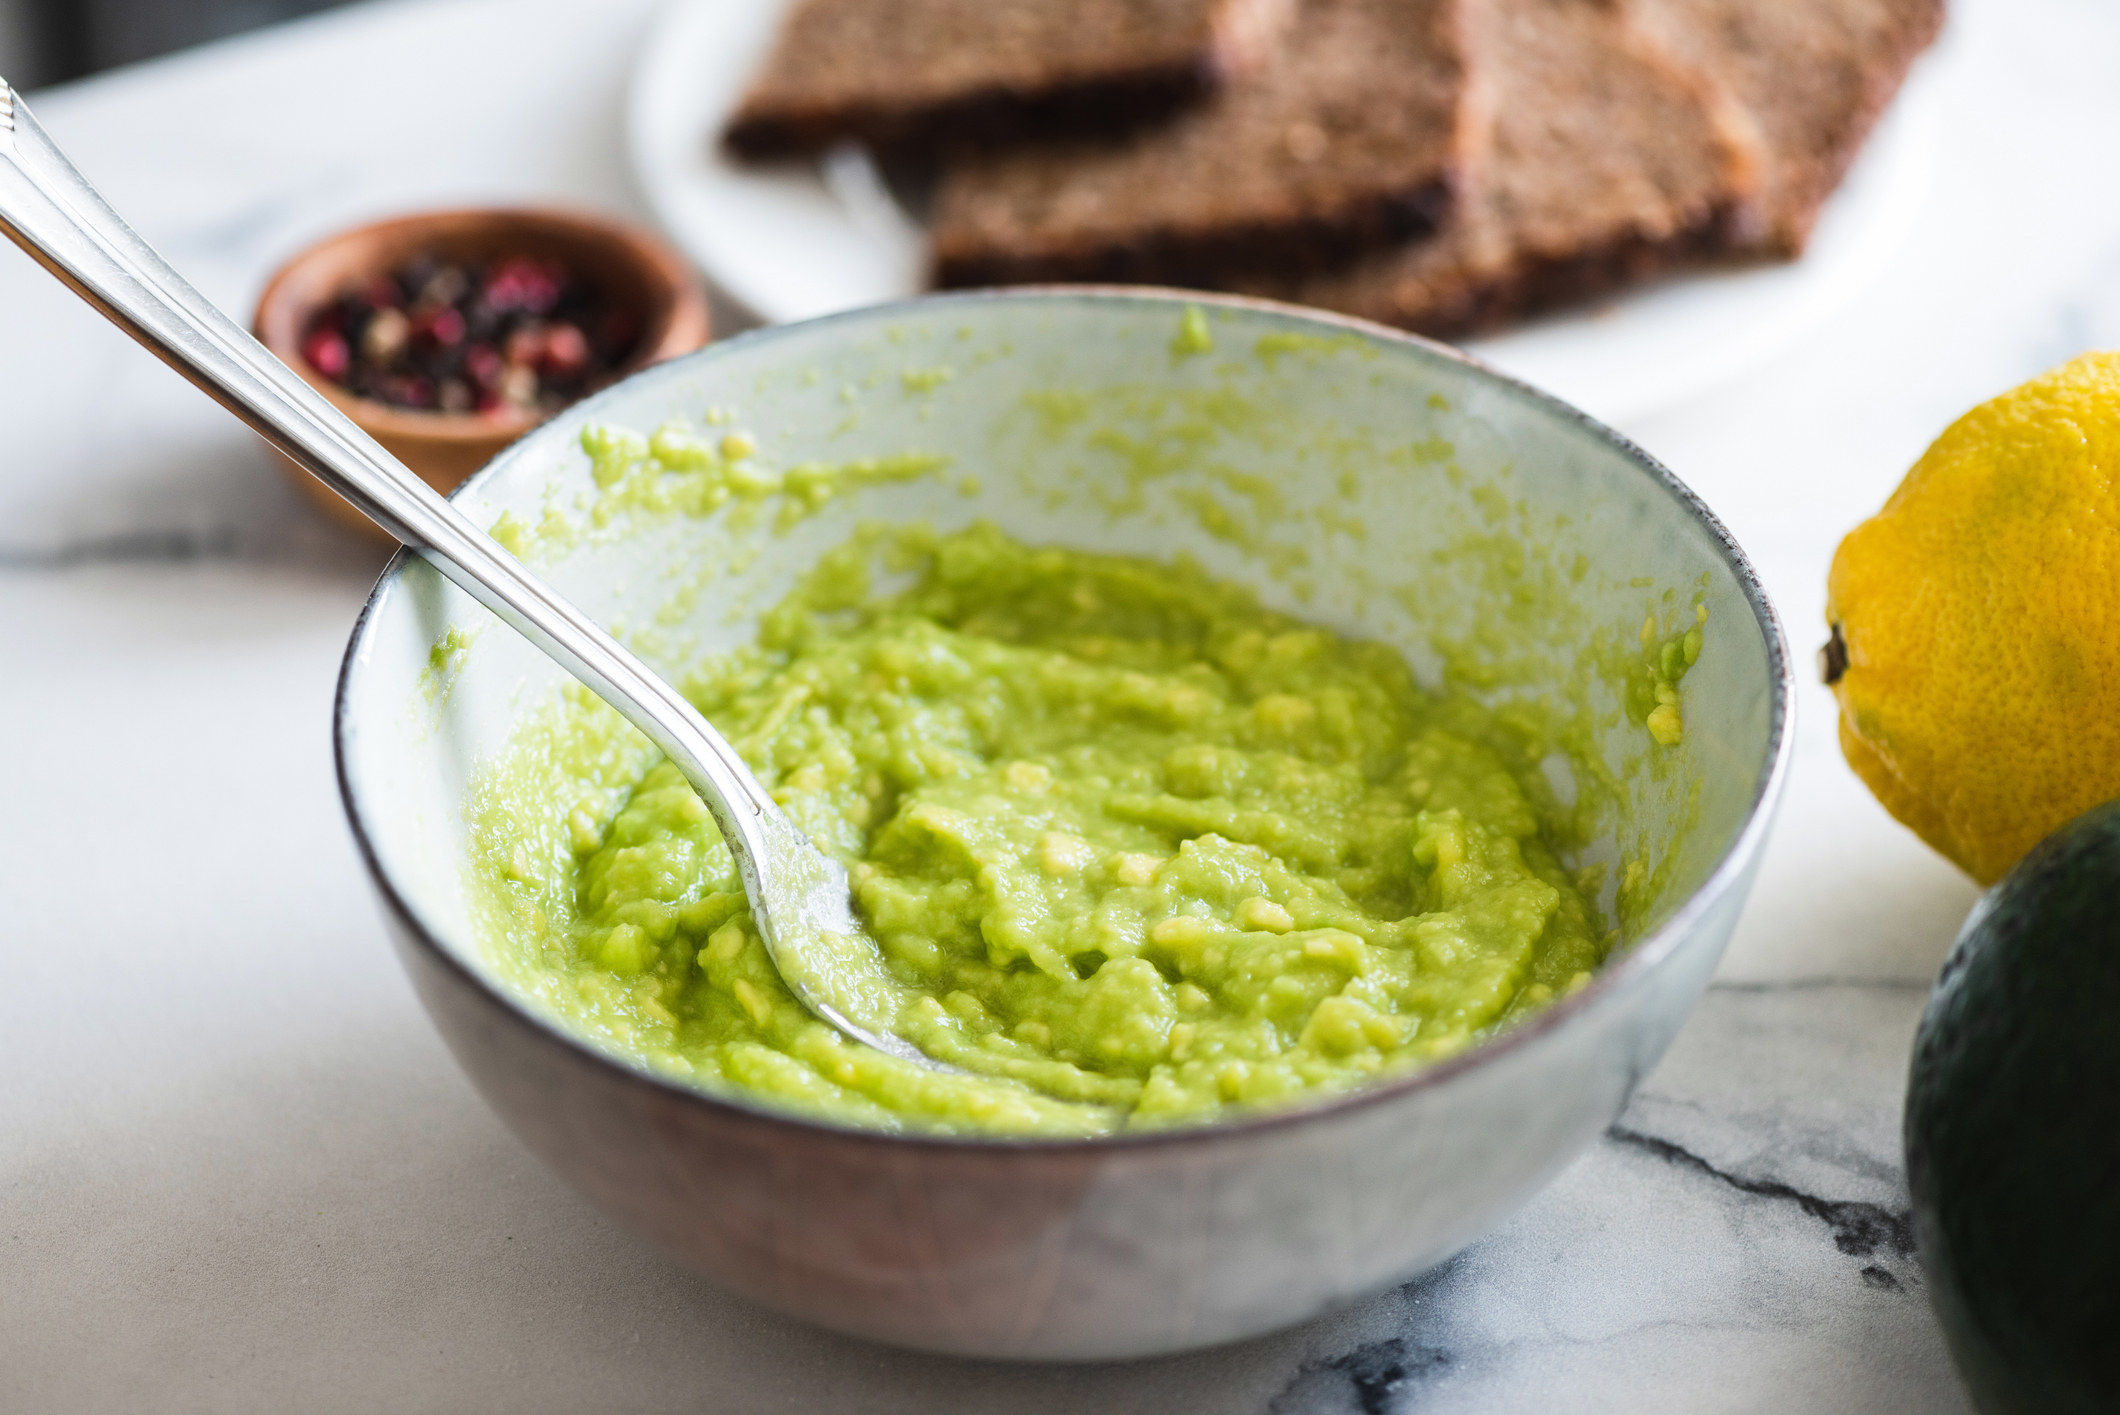 A bowl of mashed avocado.